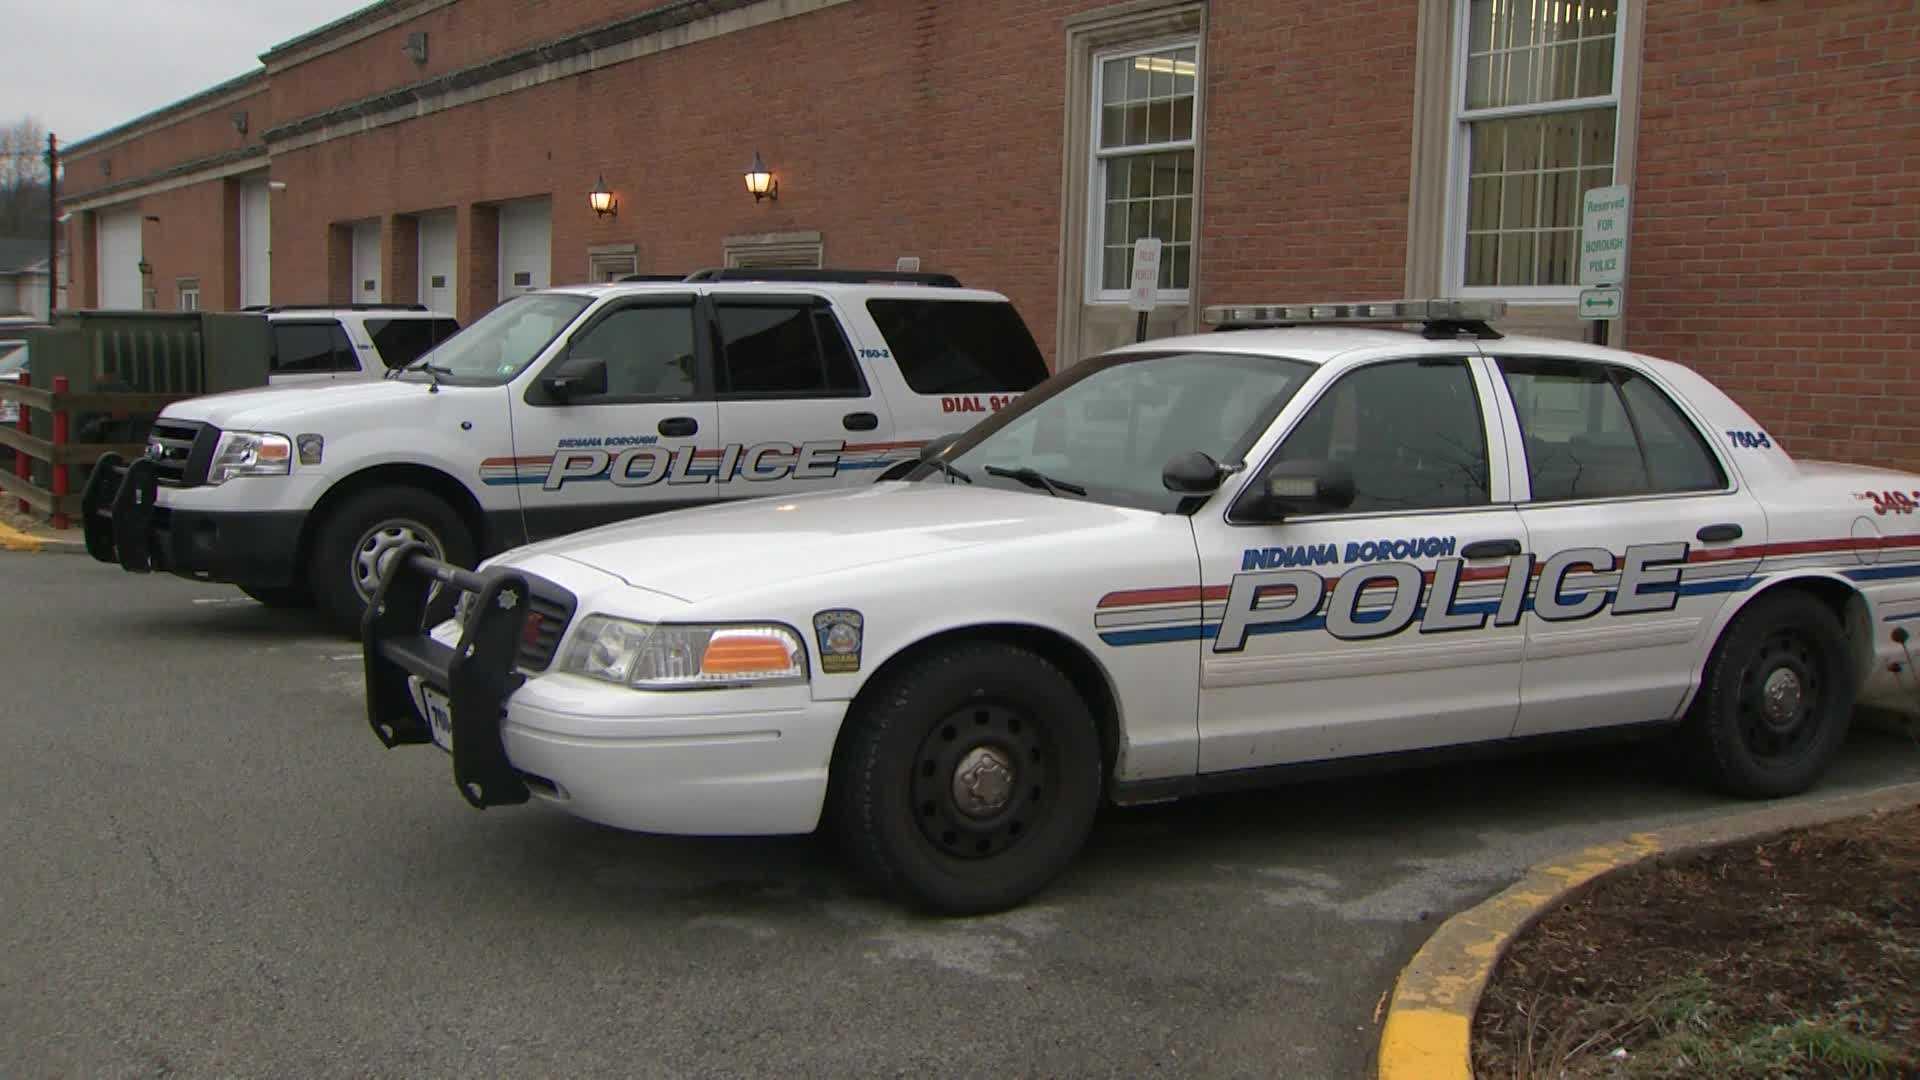 Indiana Borough police cars